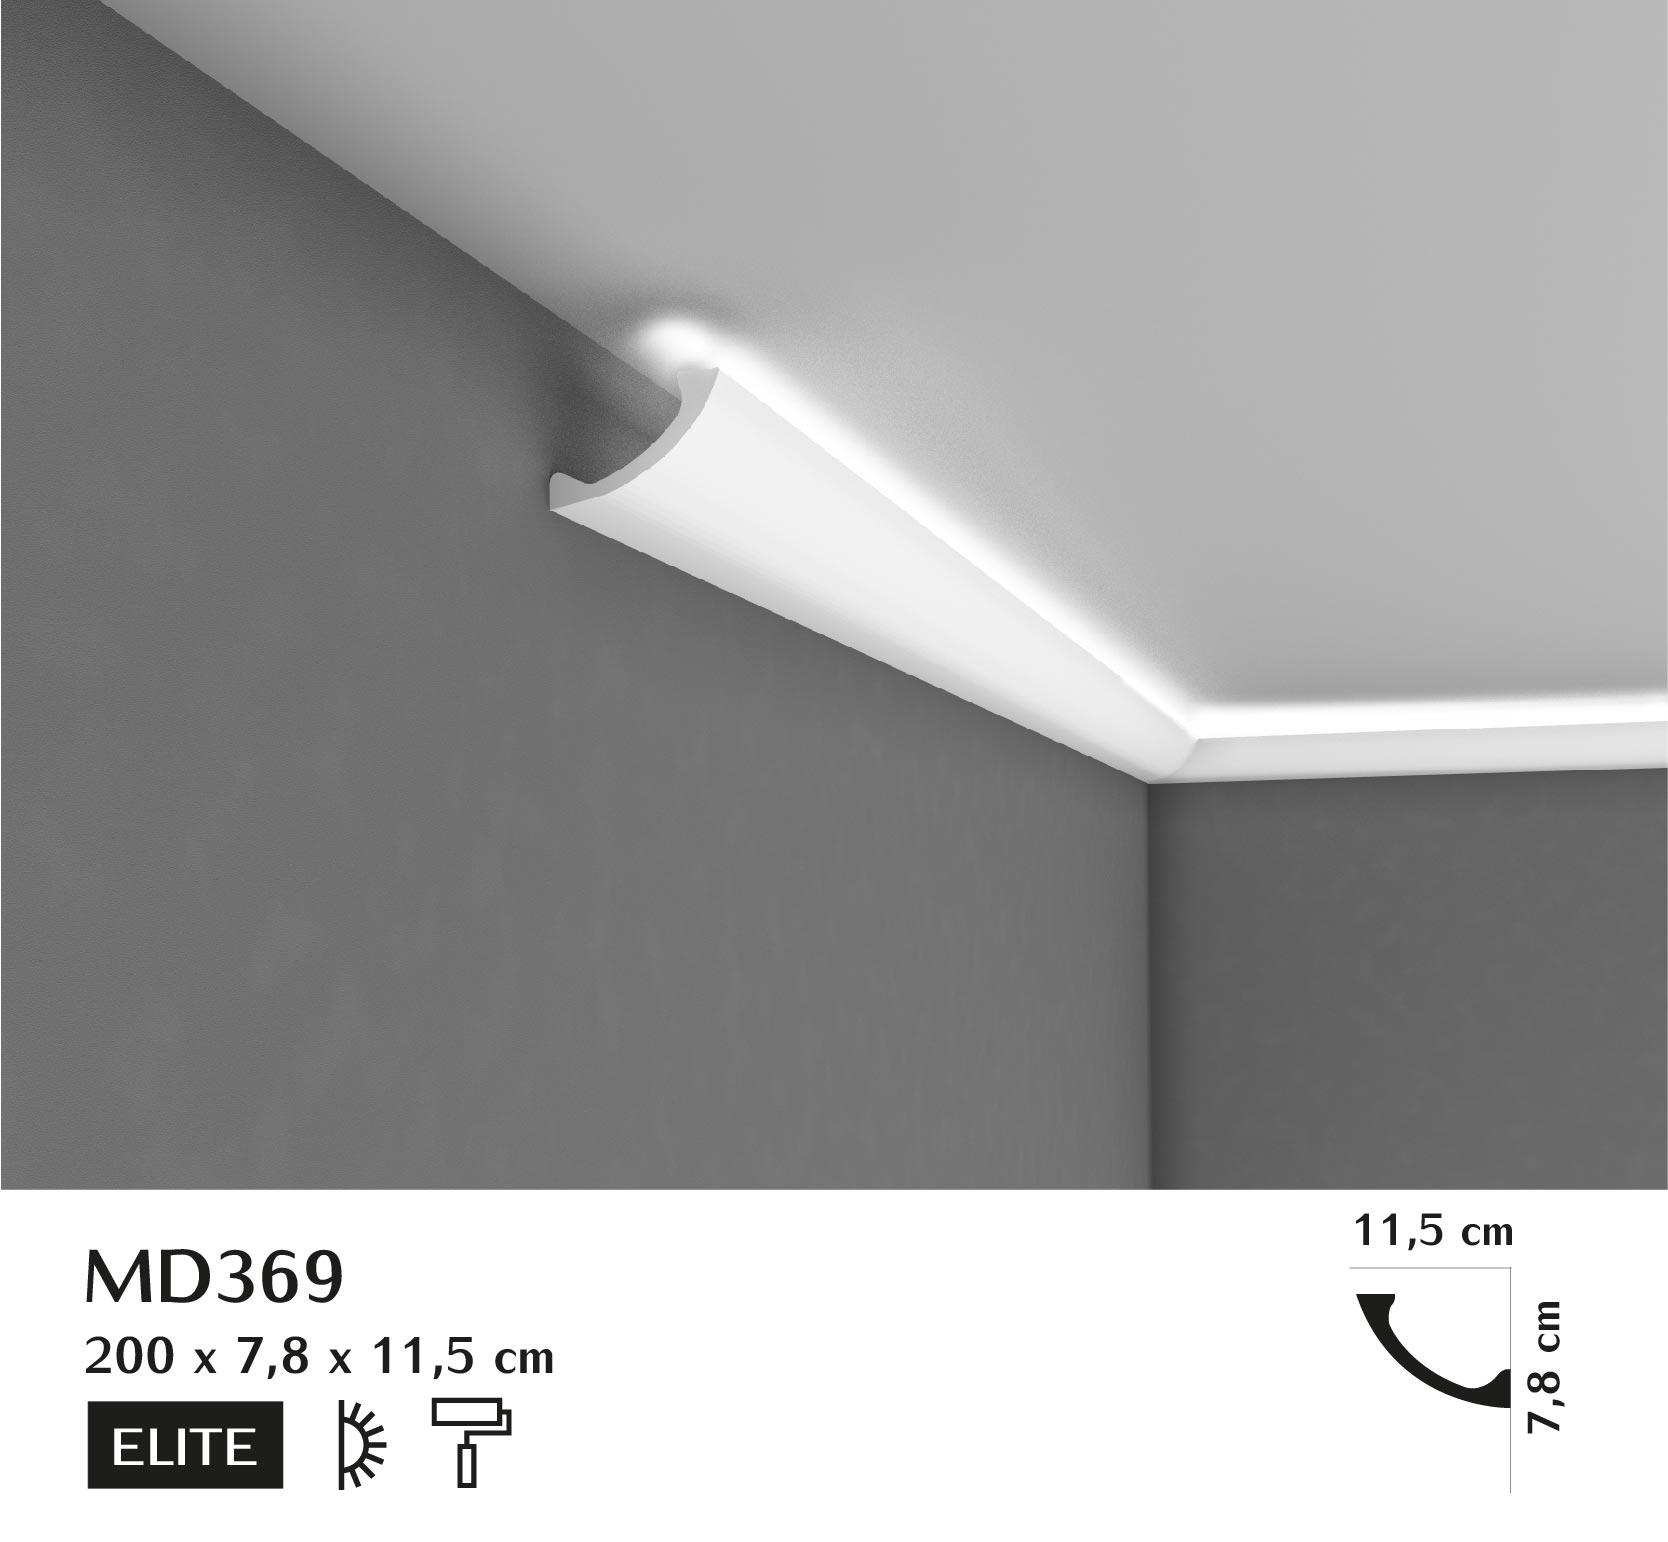 Md369 1